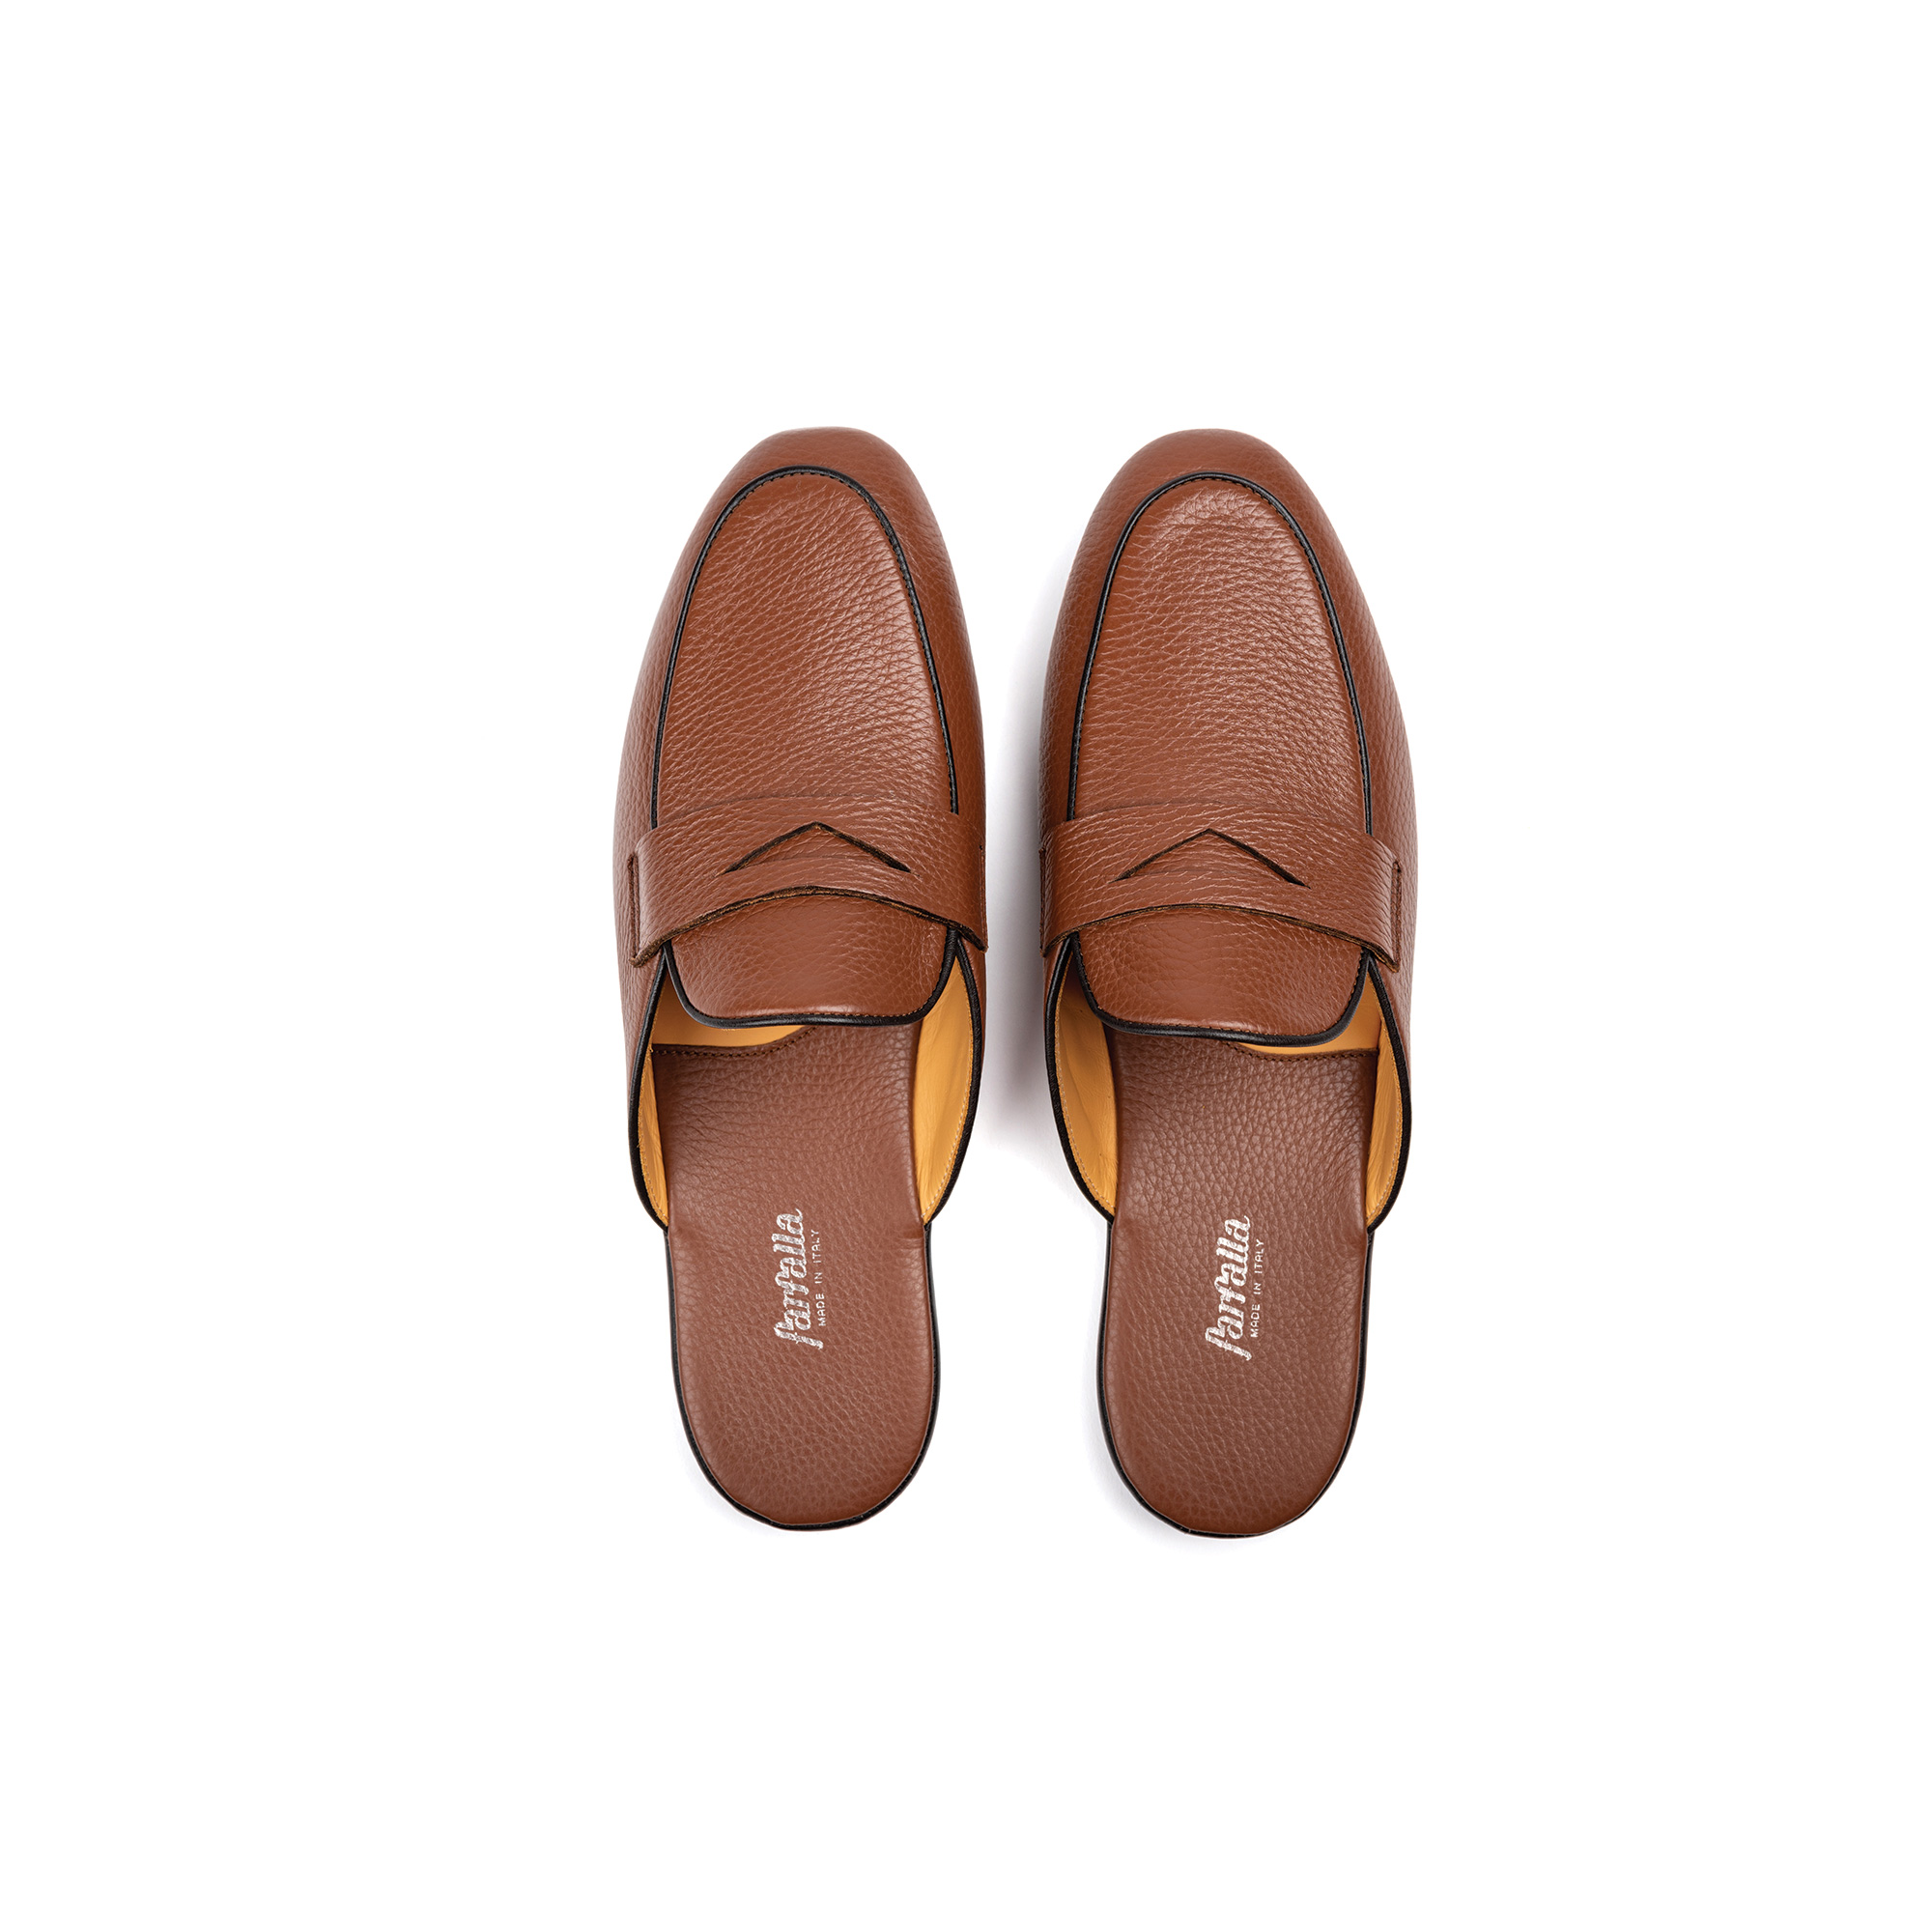 Indoor classic slipper in nuez deerskin - Farfalla italian slippers